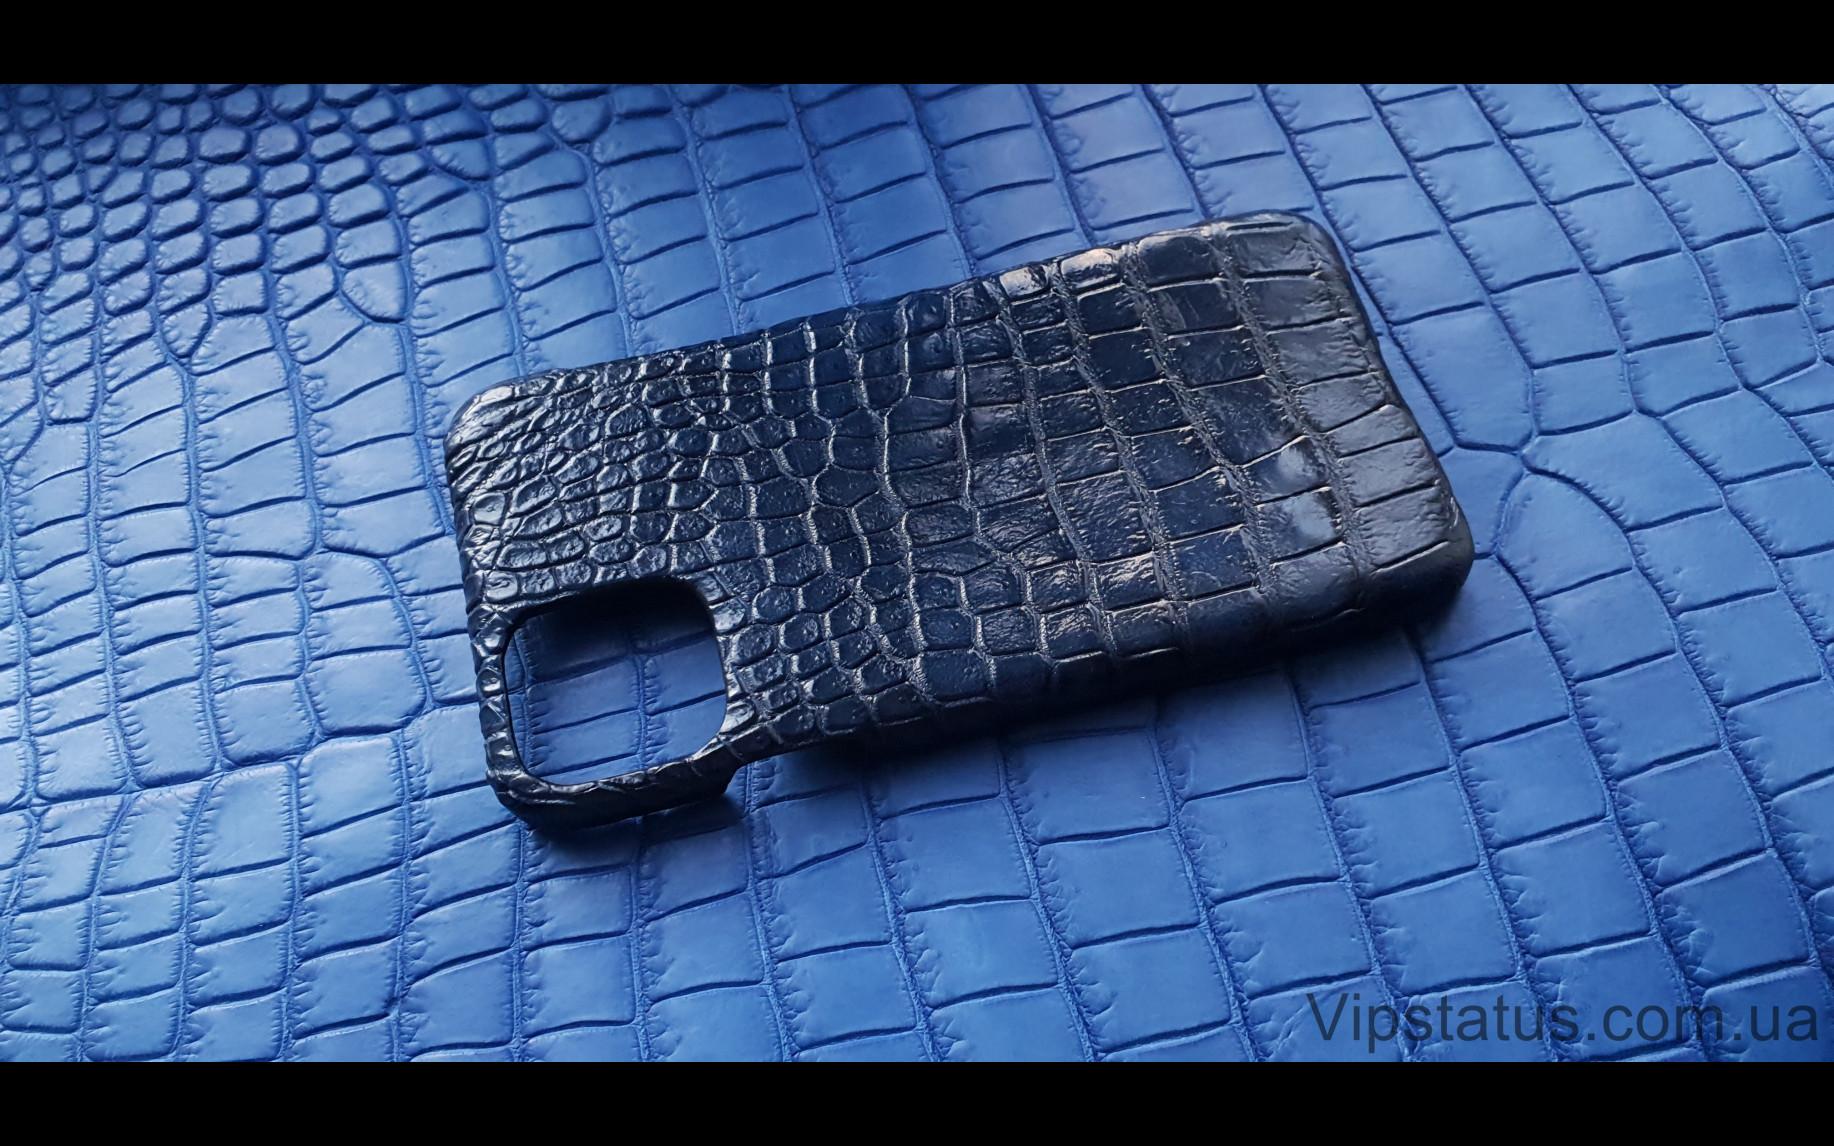 Elite Dark Blue Вип чехол IPhone 11 Pro Max кожа крокодила Dark Blue Vip case IPhone 11 Pro Max Crocodile leather image 1